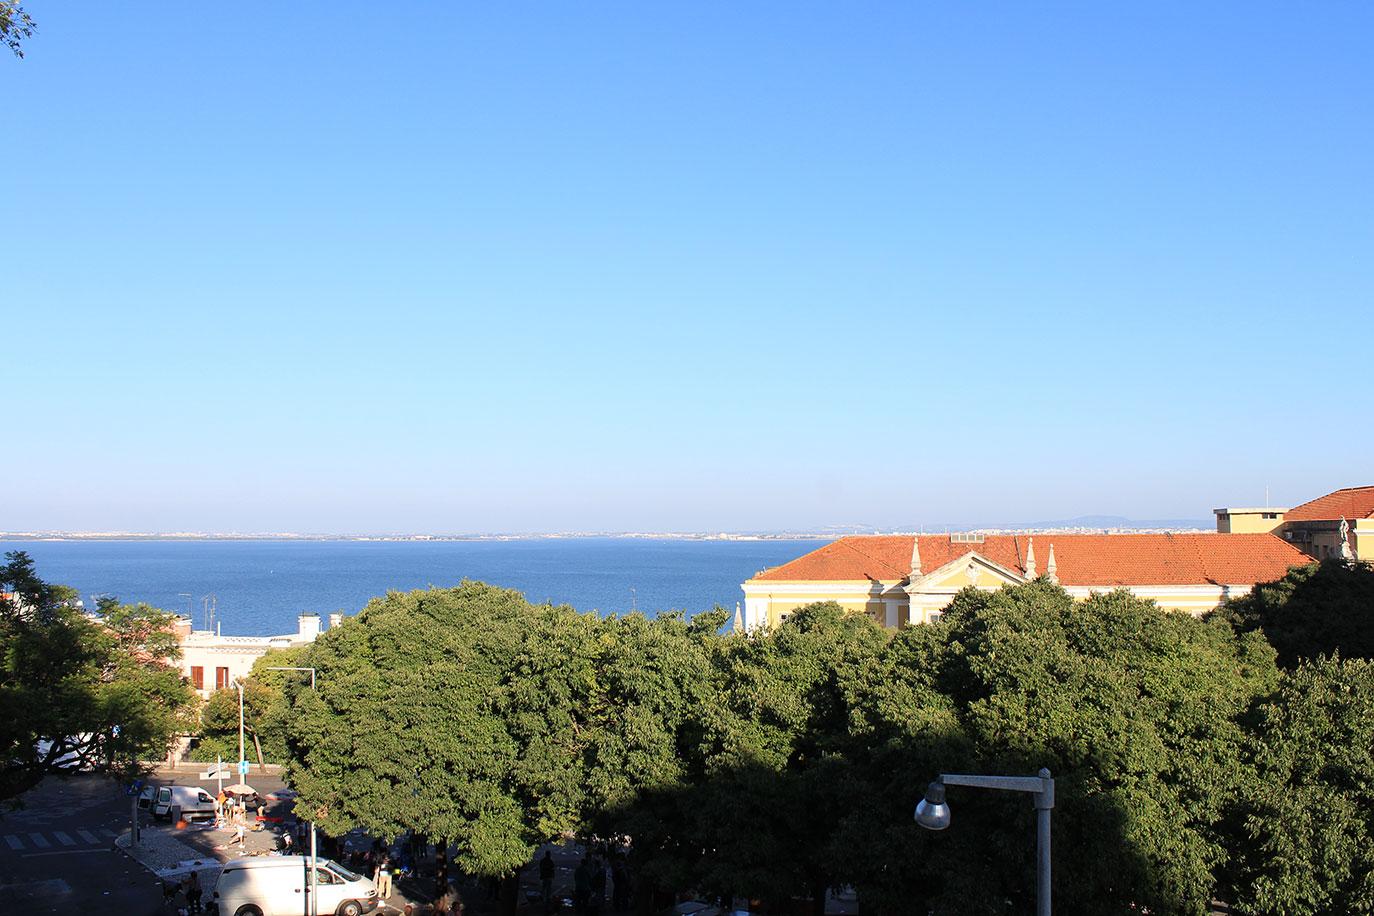 banco de jardim lisboa:Miradouro do Jardim Botto Machado em Lisboa  #0166CA 1374x916